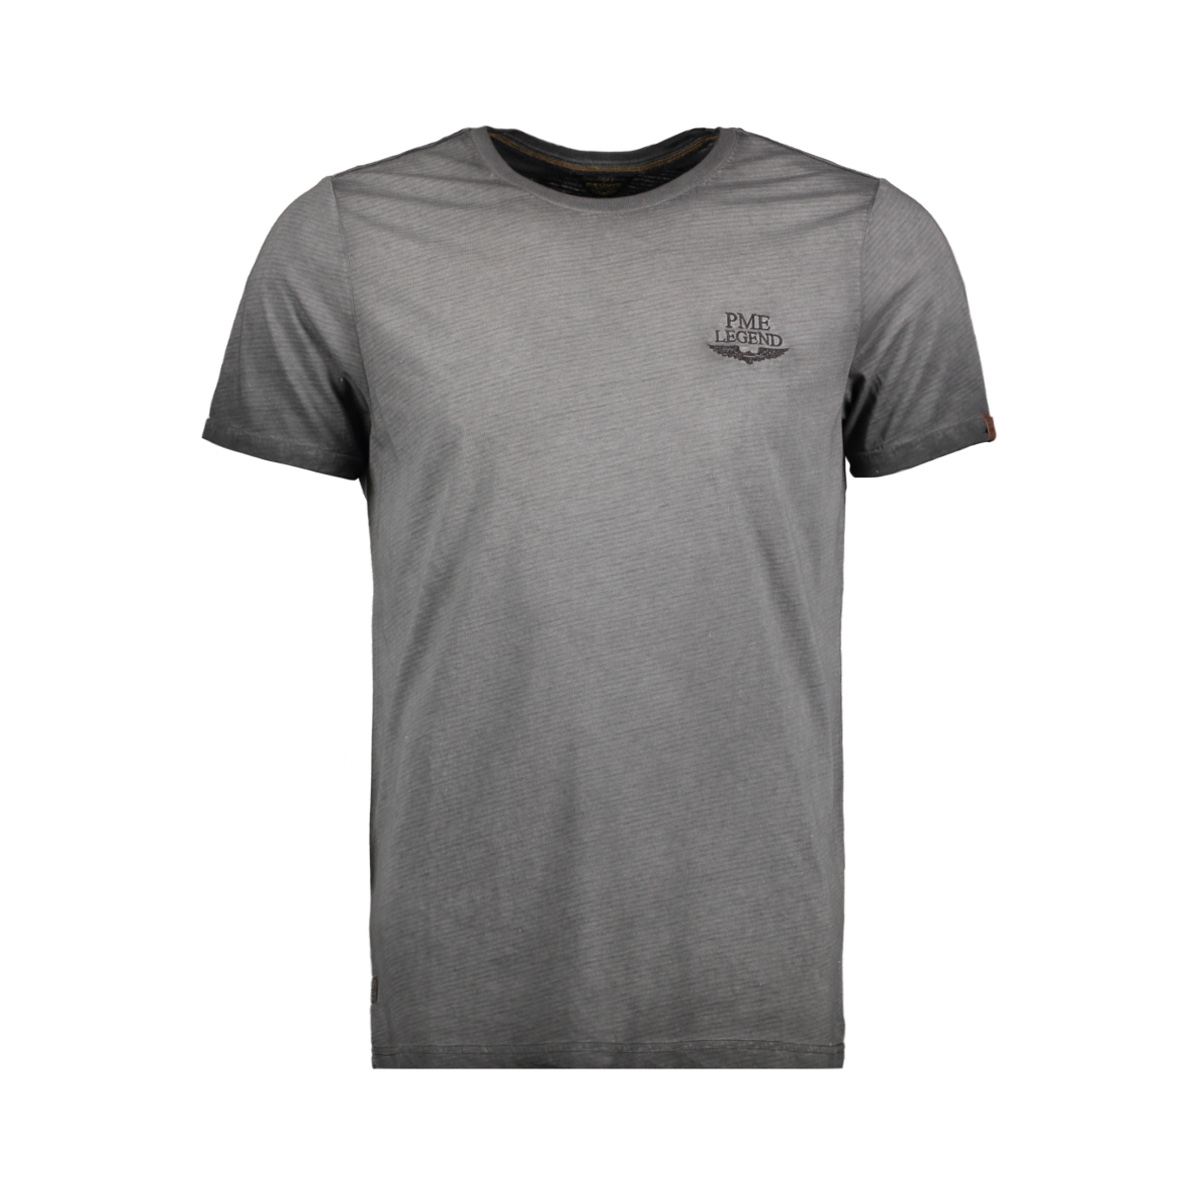 ptss178531 pme legend t-shirt 9068